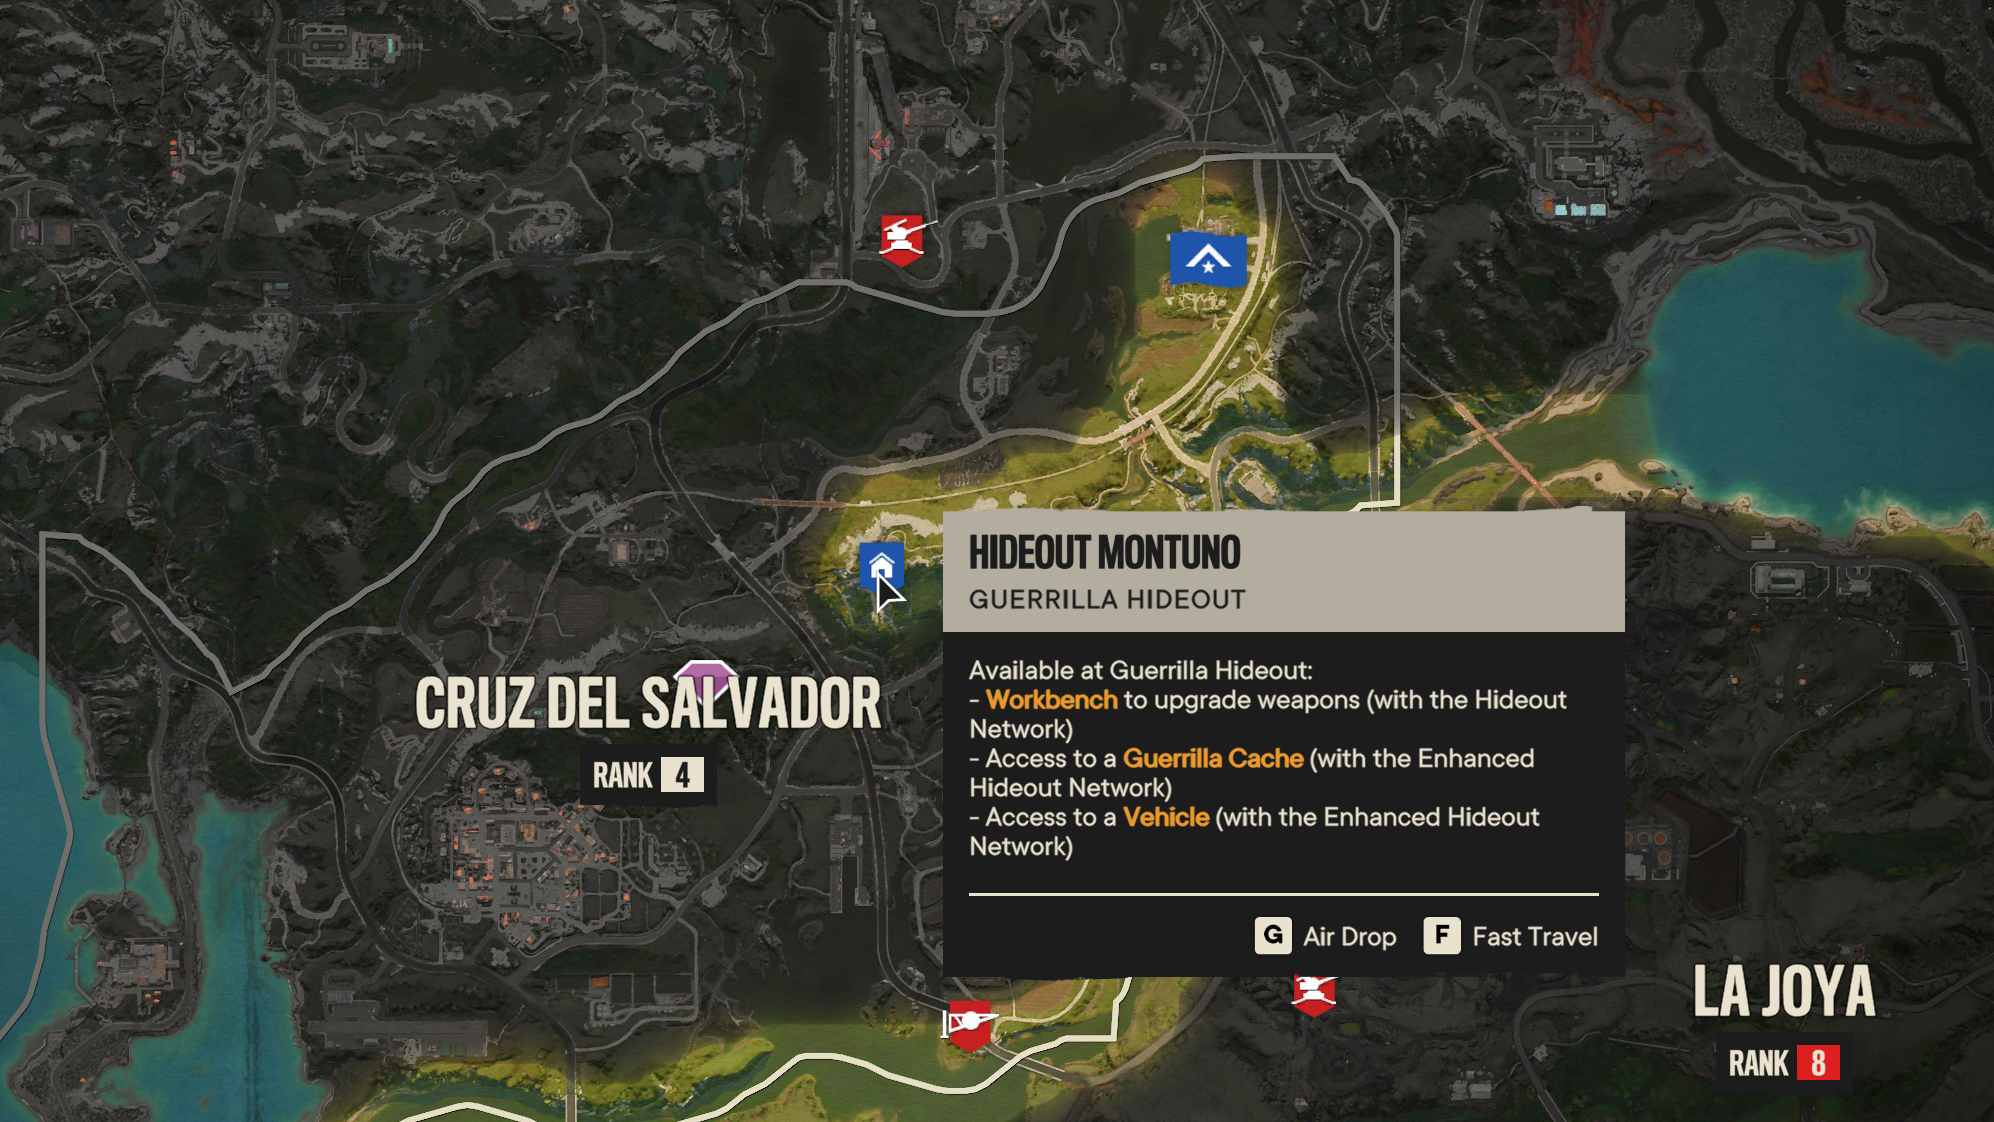 Buzzer location on Far Cry 6 map